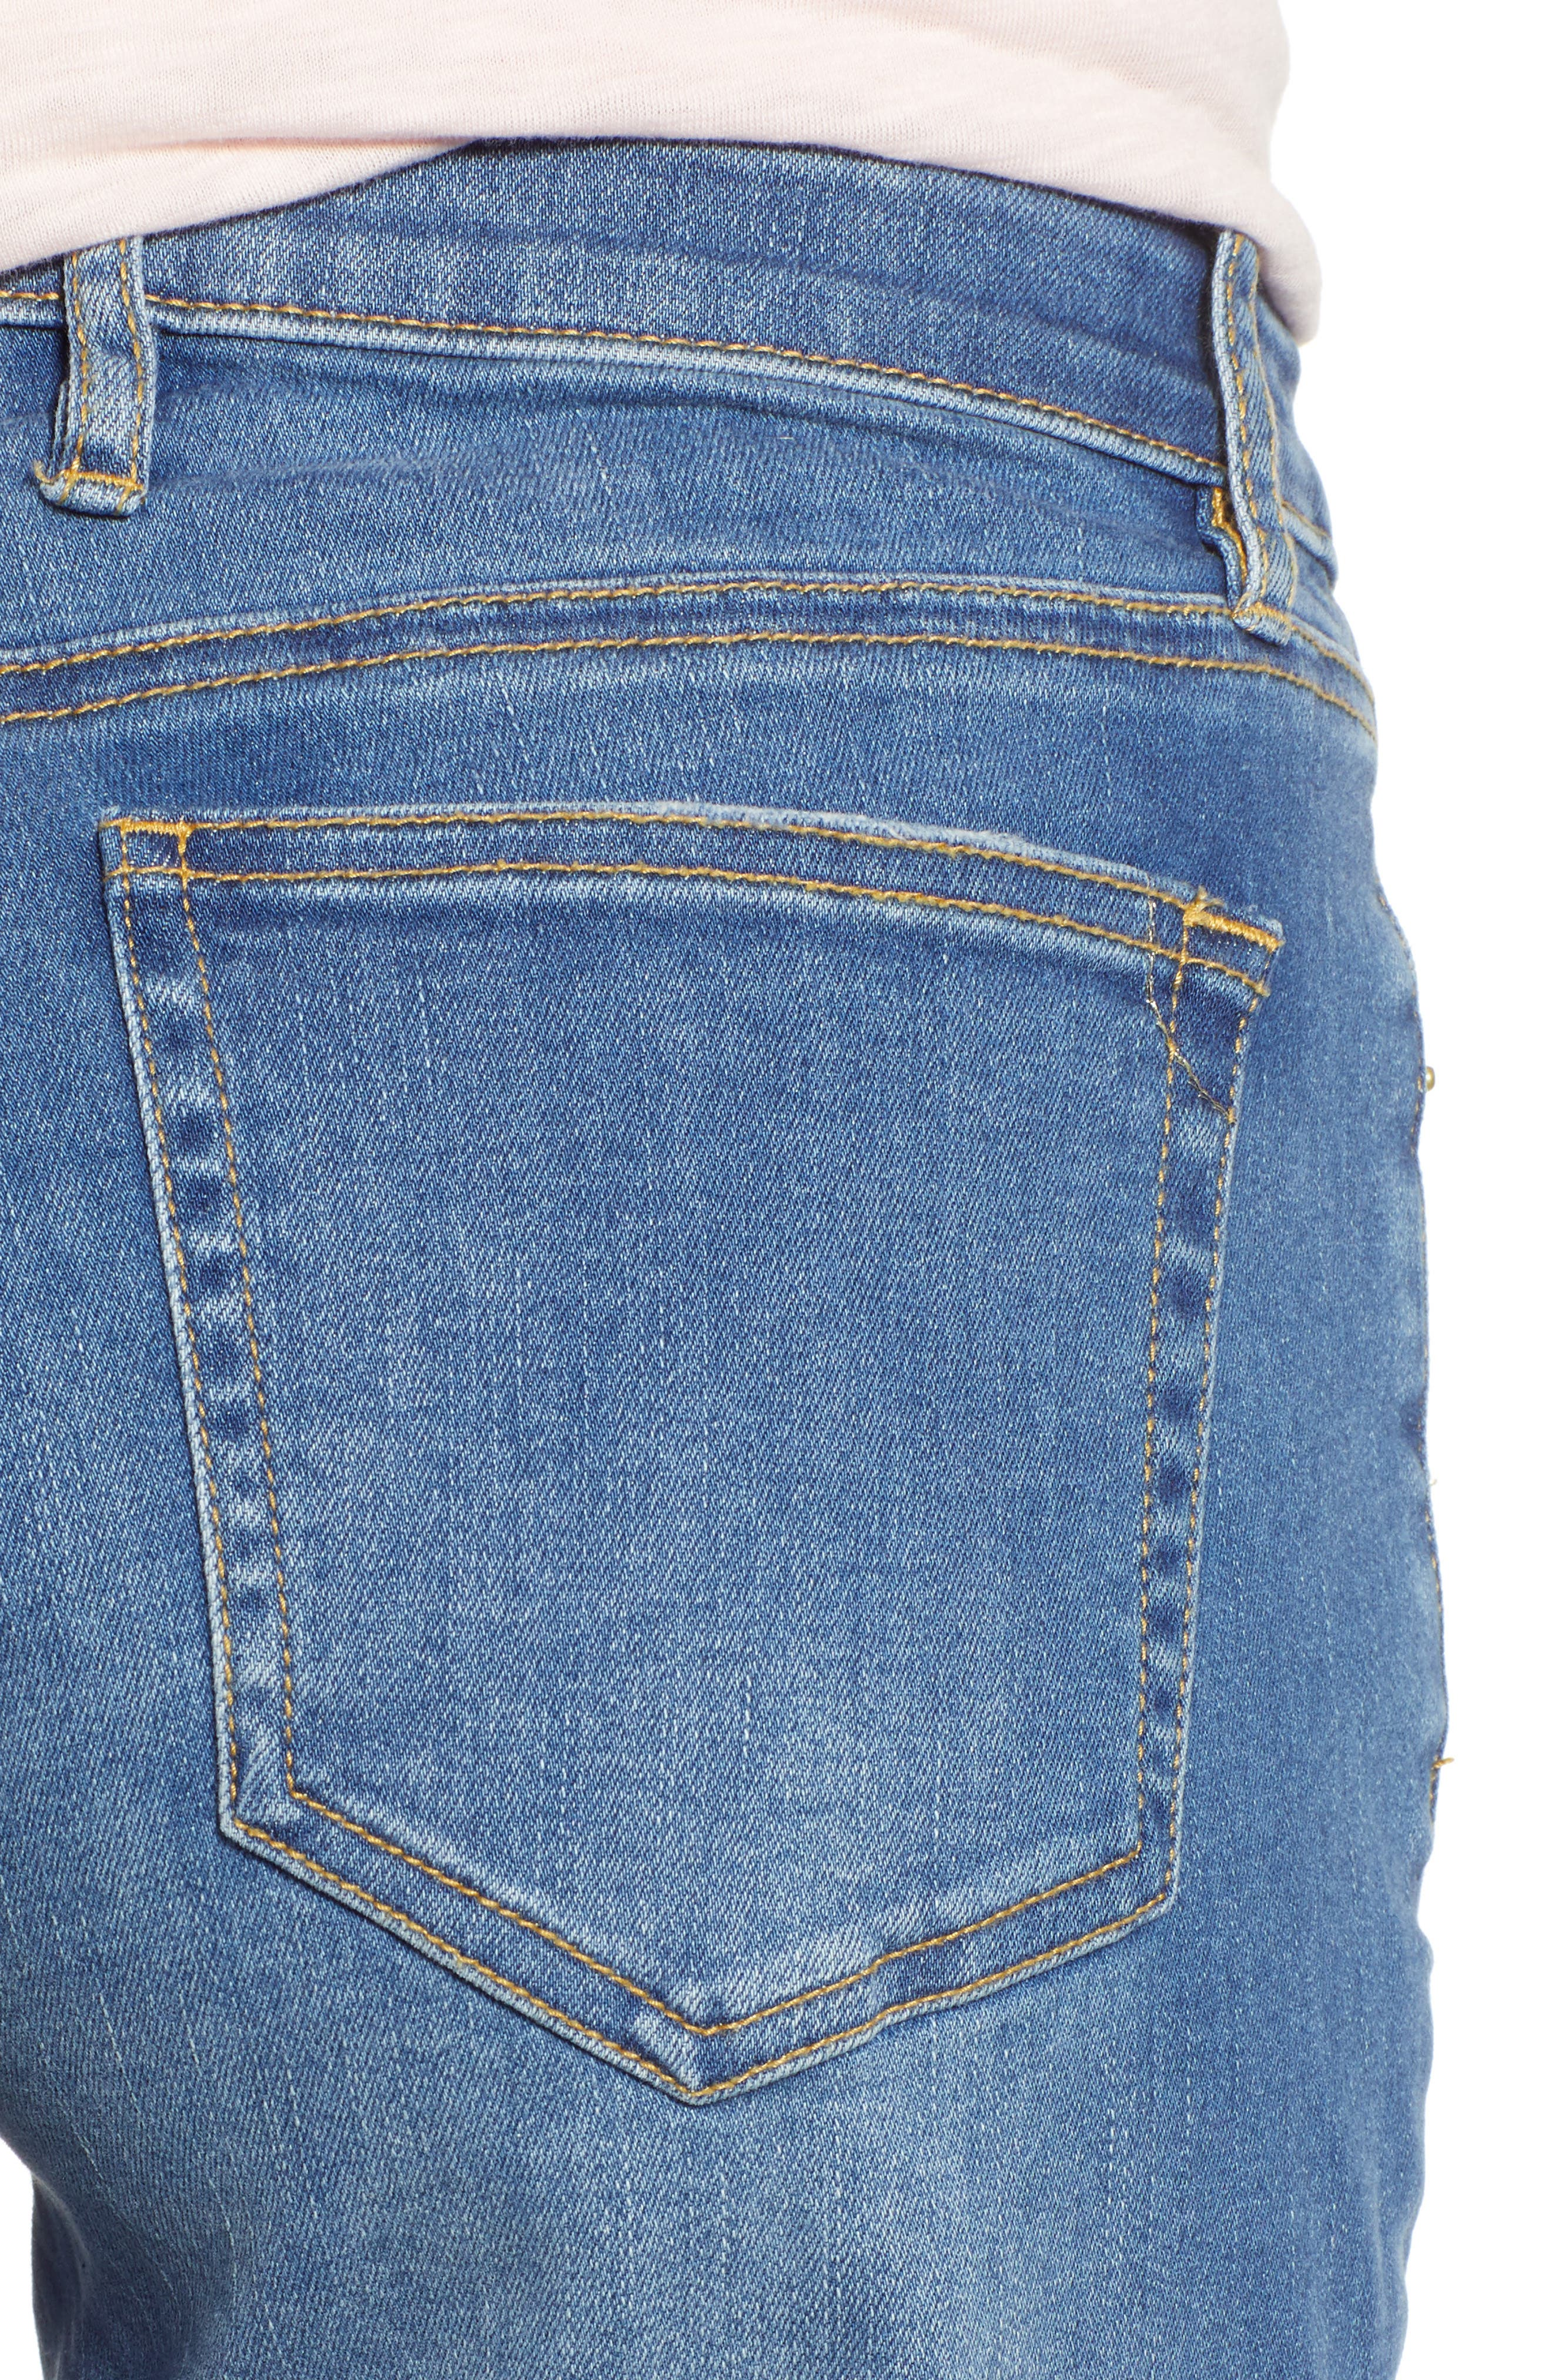 Tema Slim Boyfriend Jeans,                             Alternate thumbnail 4, color,                             407